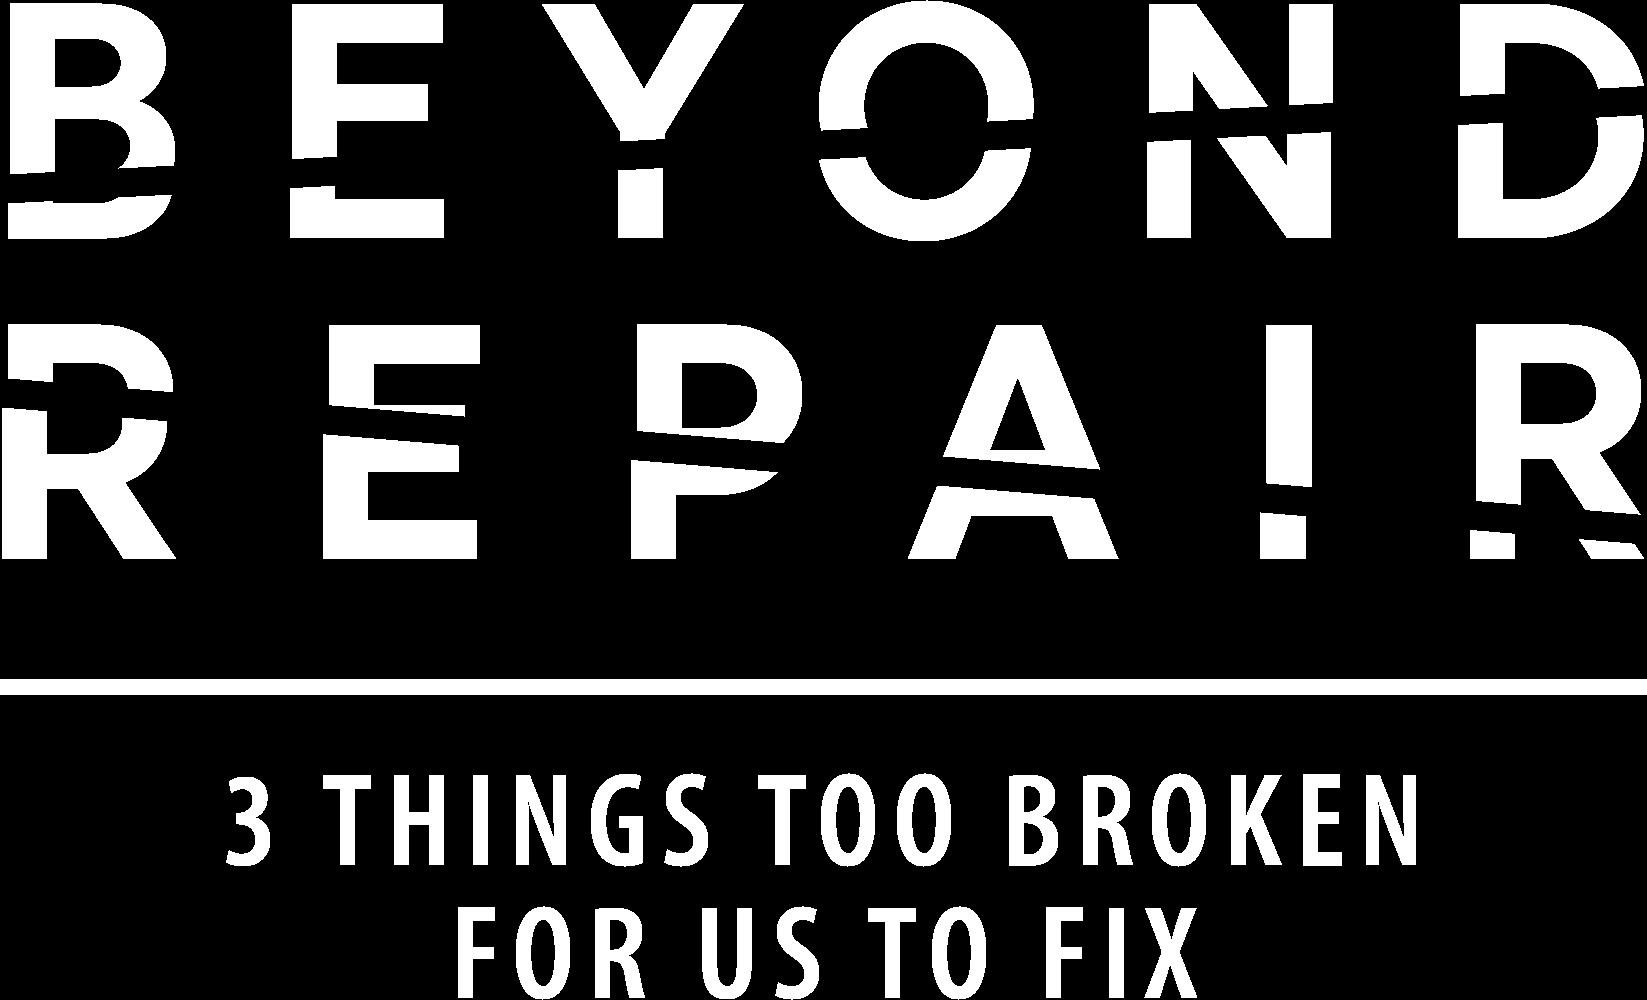 Beyond Repair: 3 Things Too Broken for Us to Fix